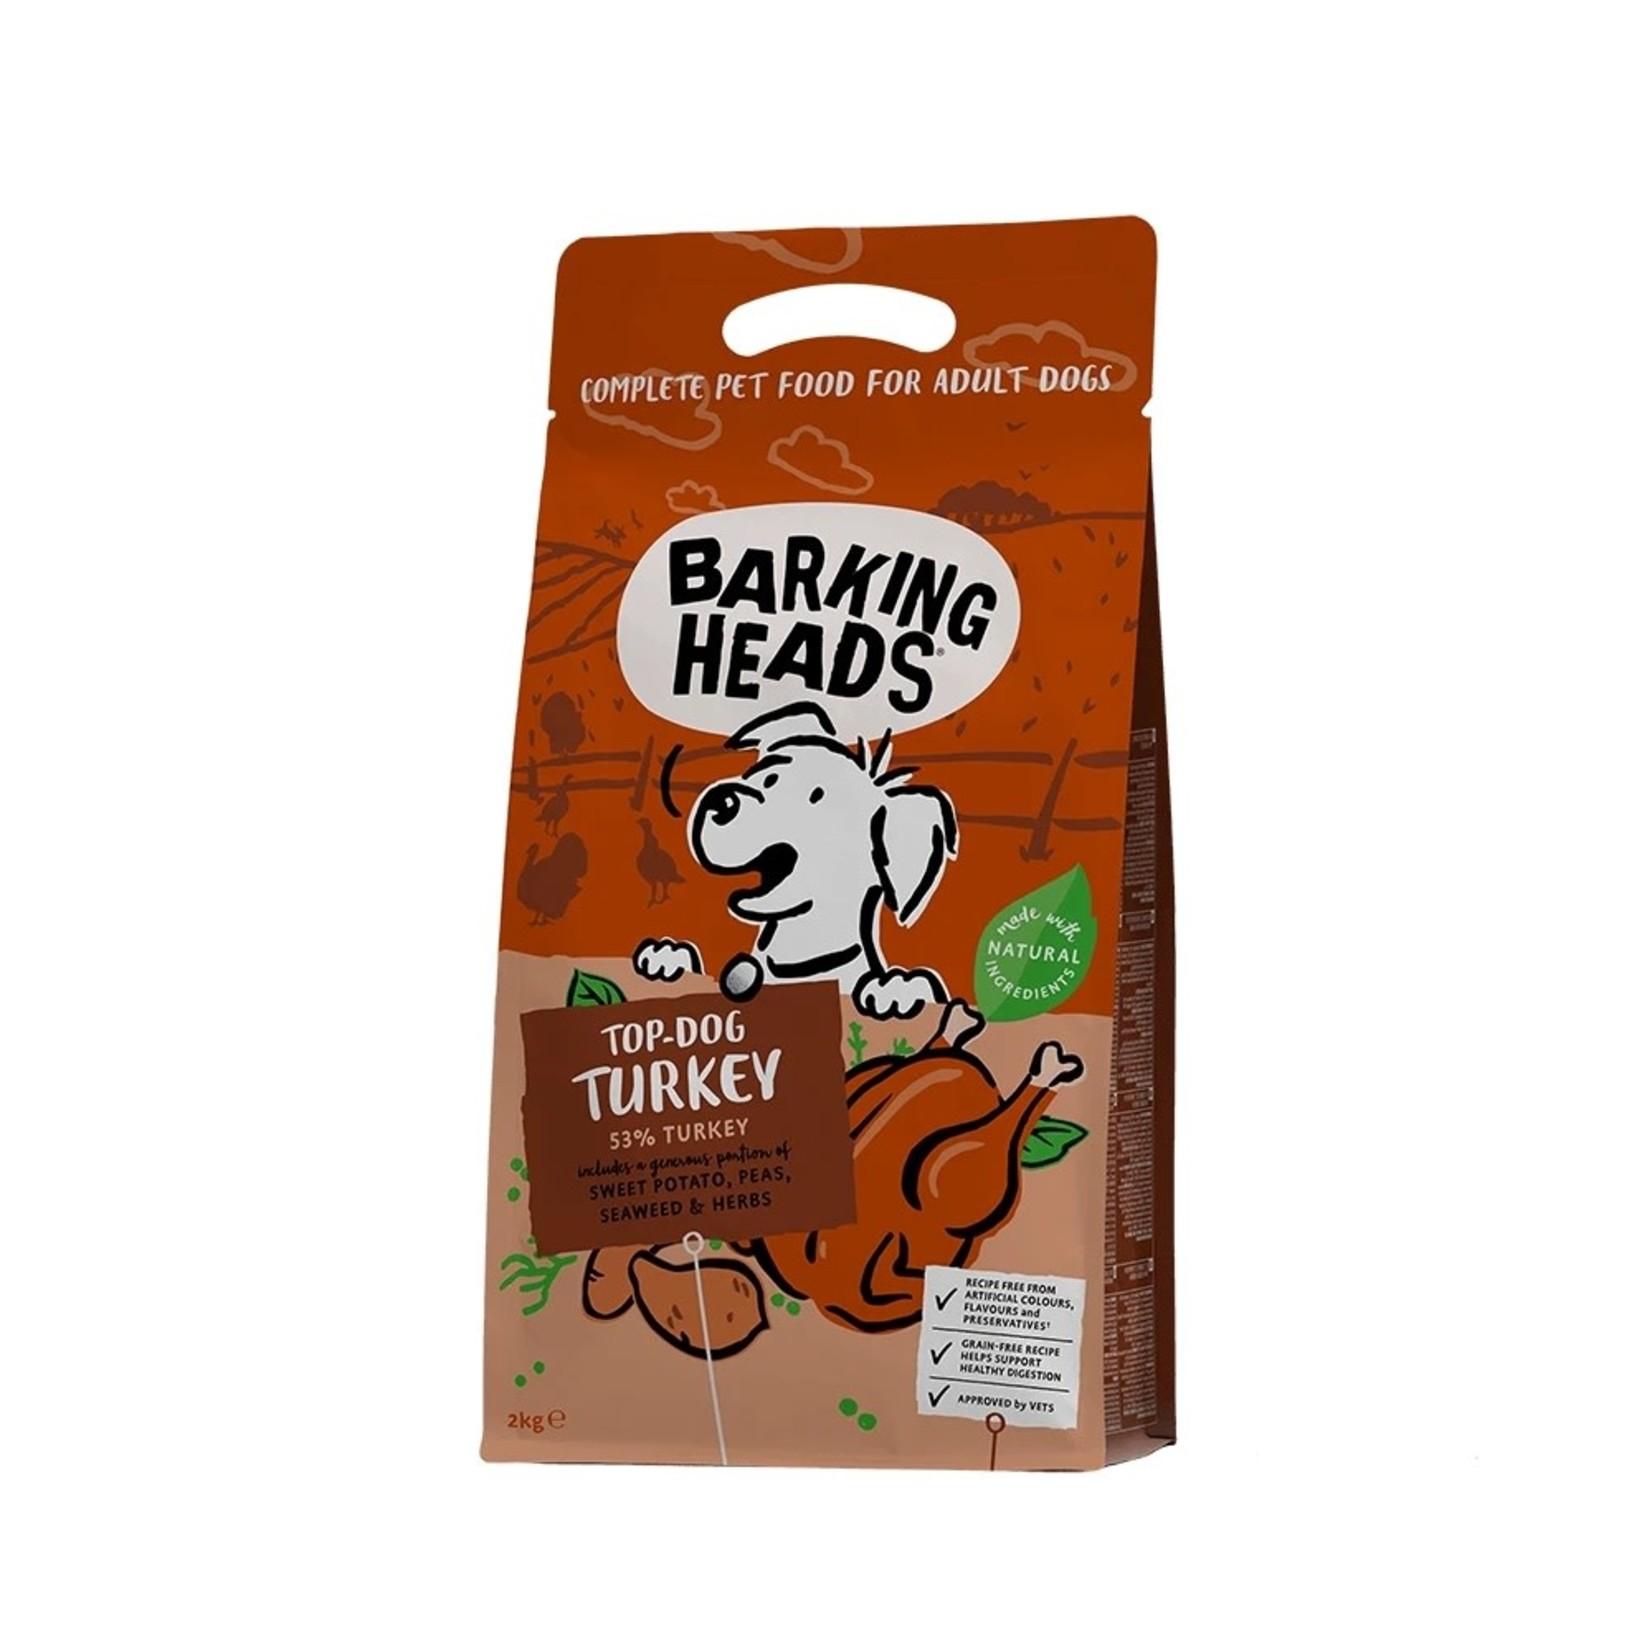 Barking Heads Top Dog Turkey Grain Free Adult Dog Dry Food